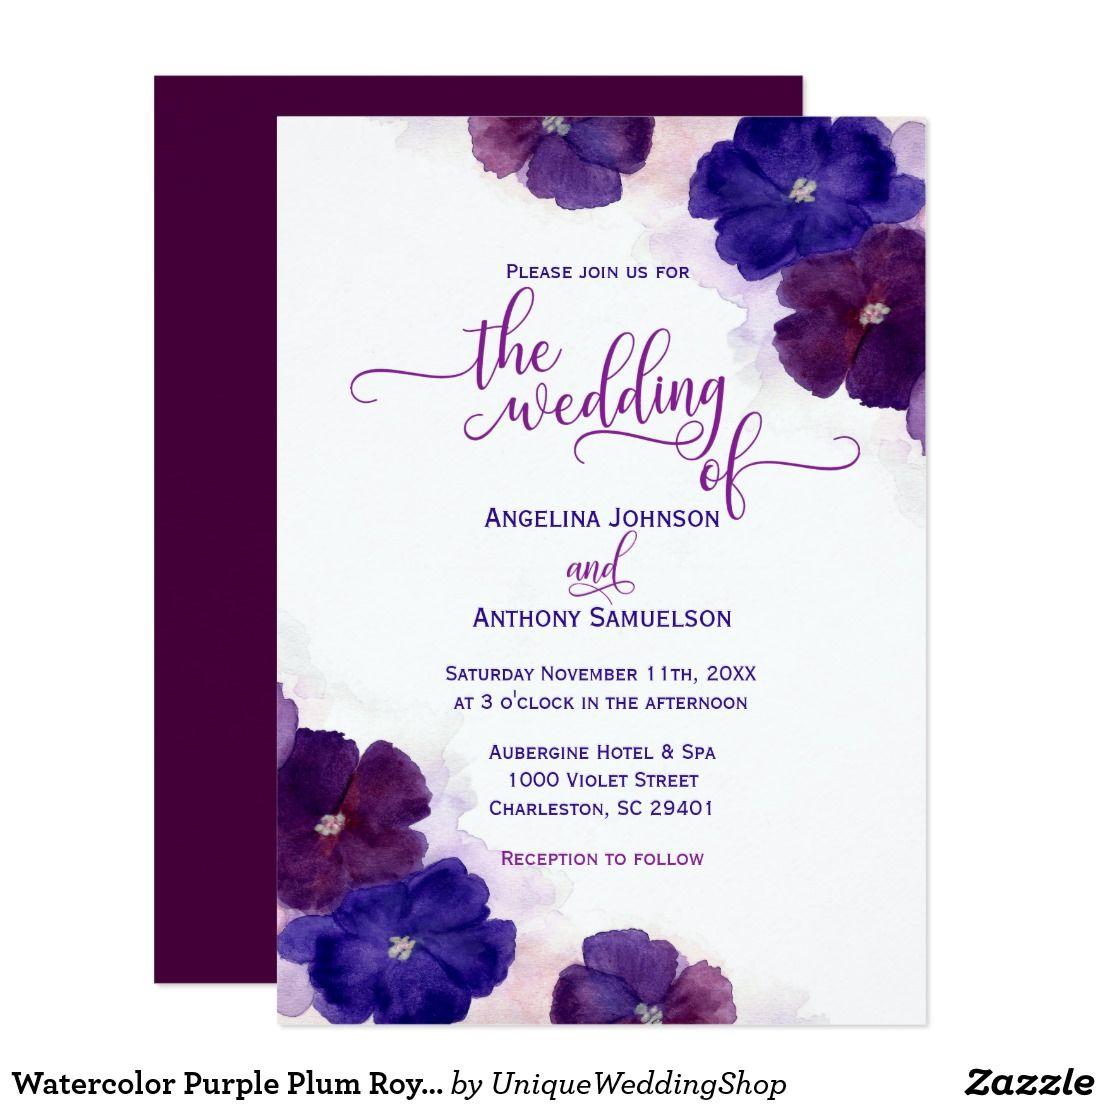 Watercolor Purple Plum Royal Blue Floral Wedding Invitation